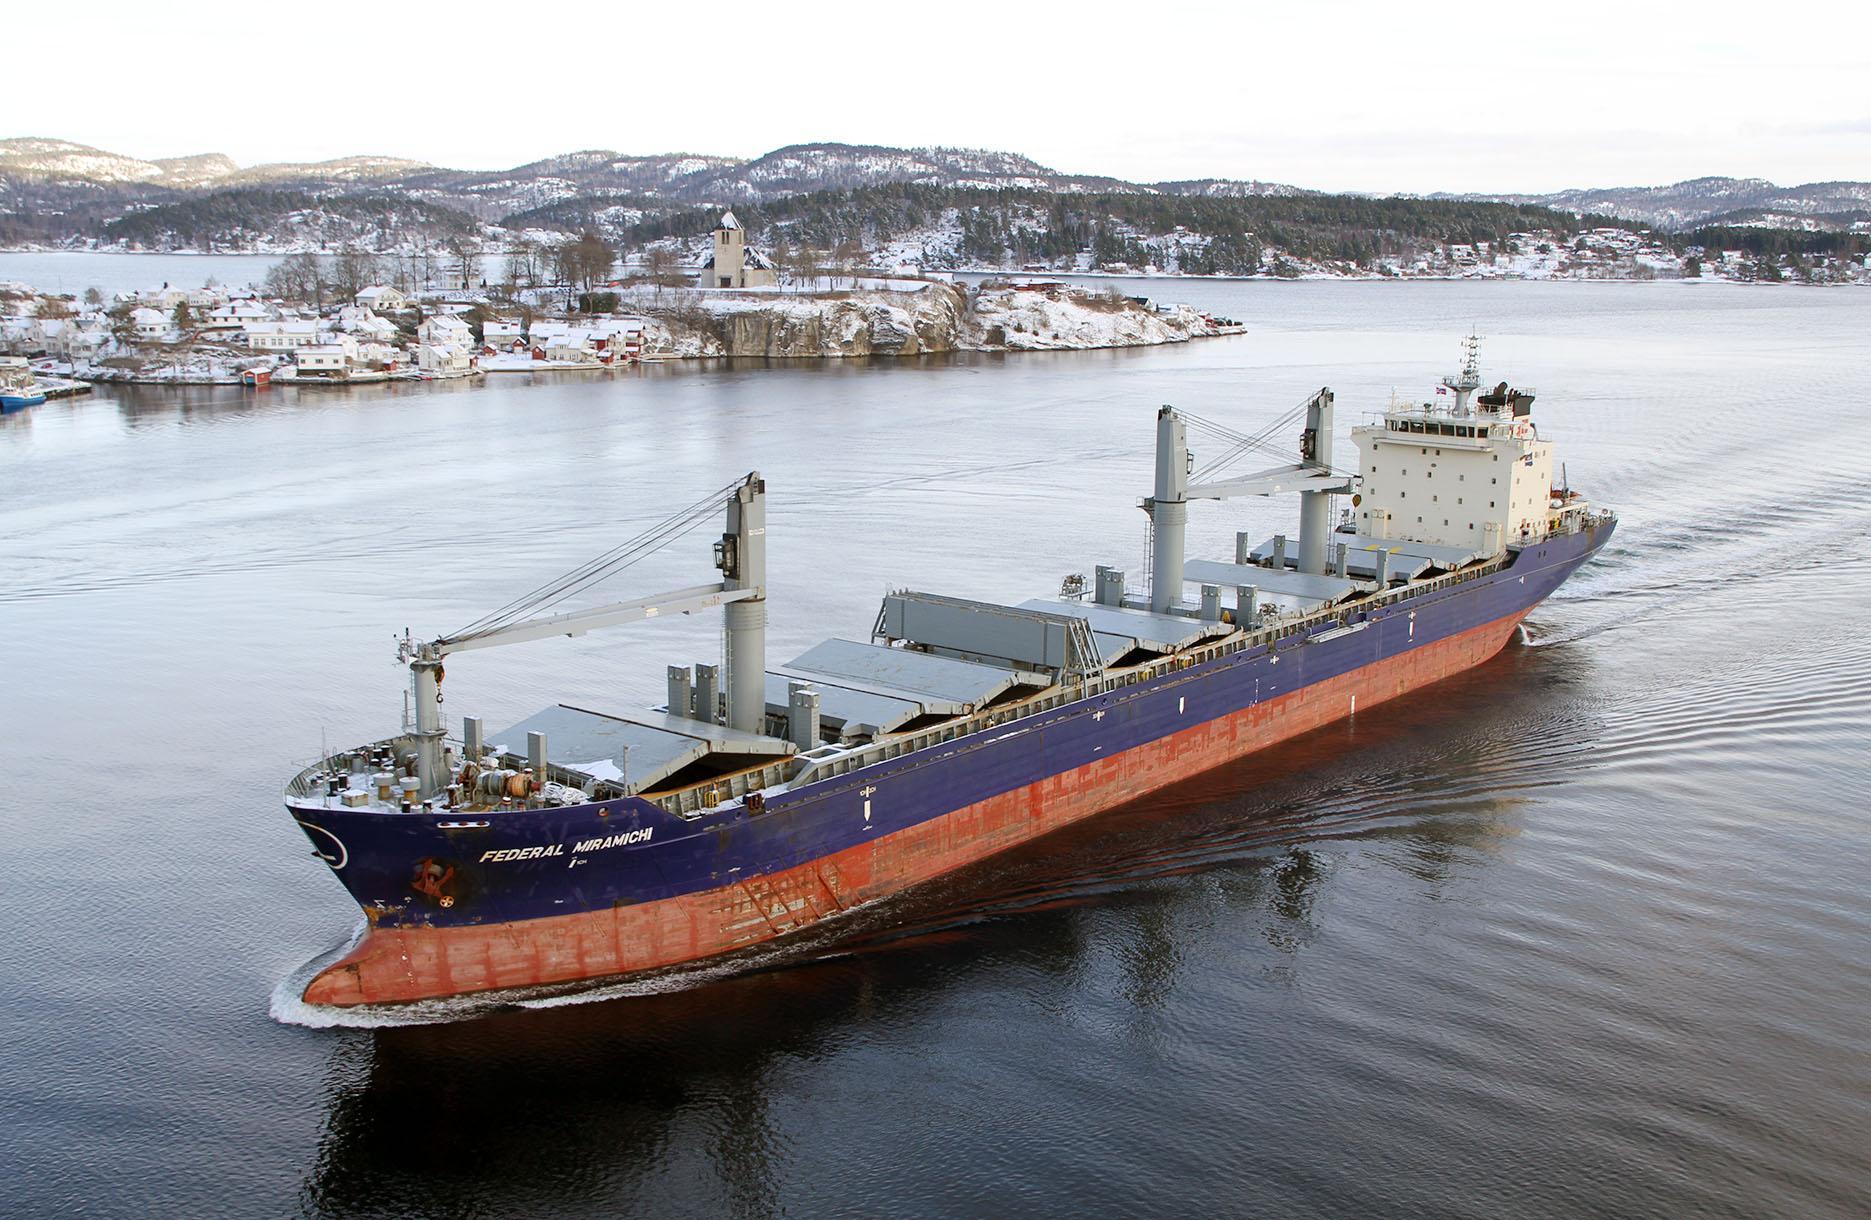 Reederei M  Lauterjung